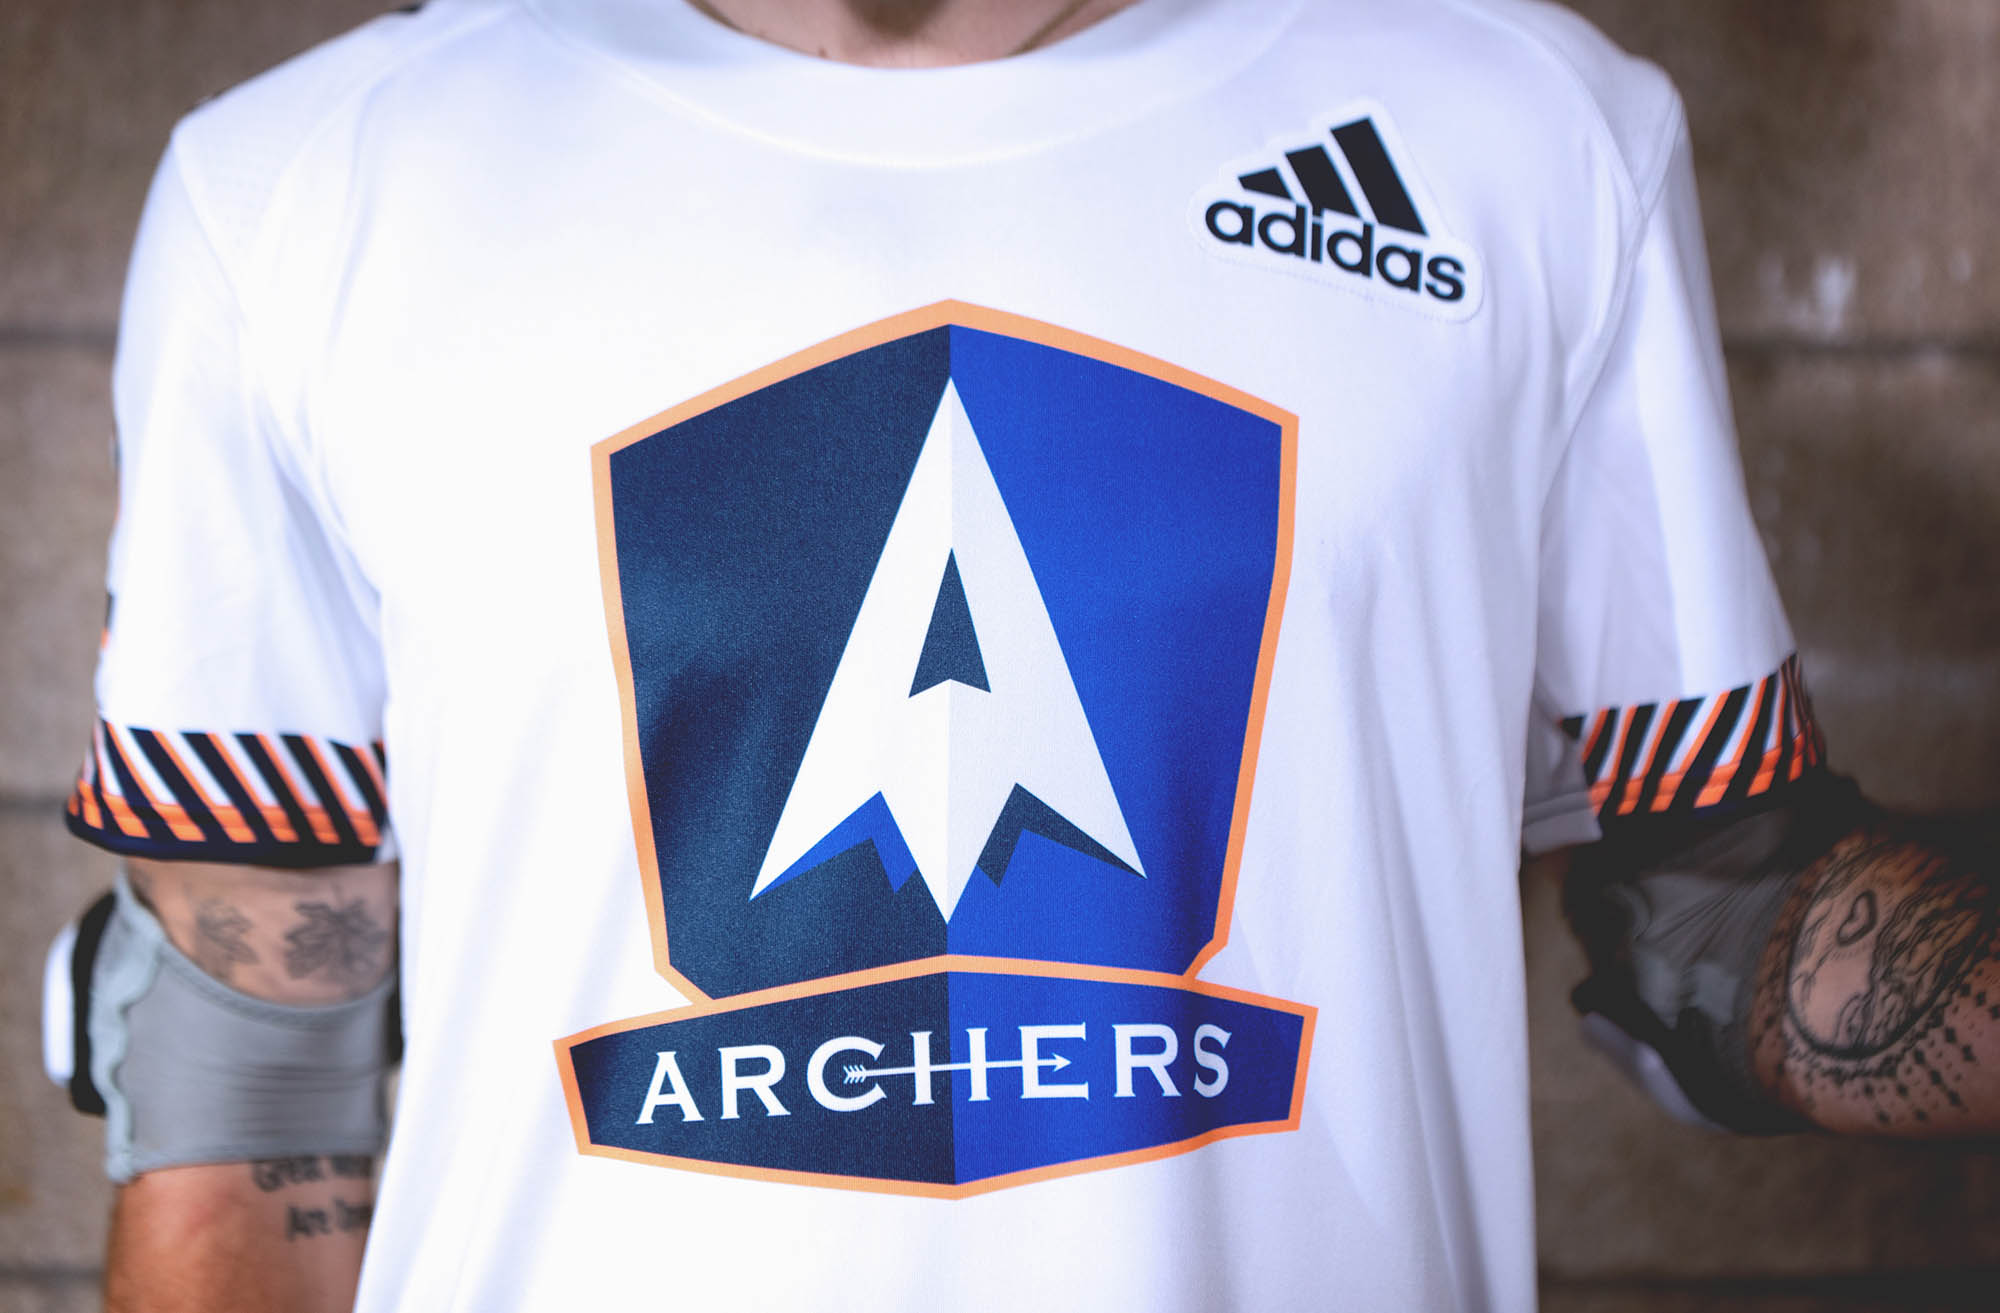 adidasLacrosse_PLL_ARCHERS_Crest_Away_01.jpg